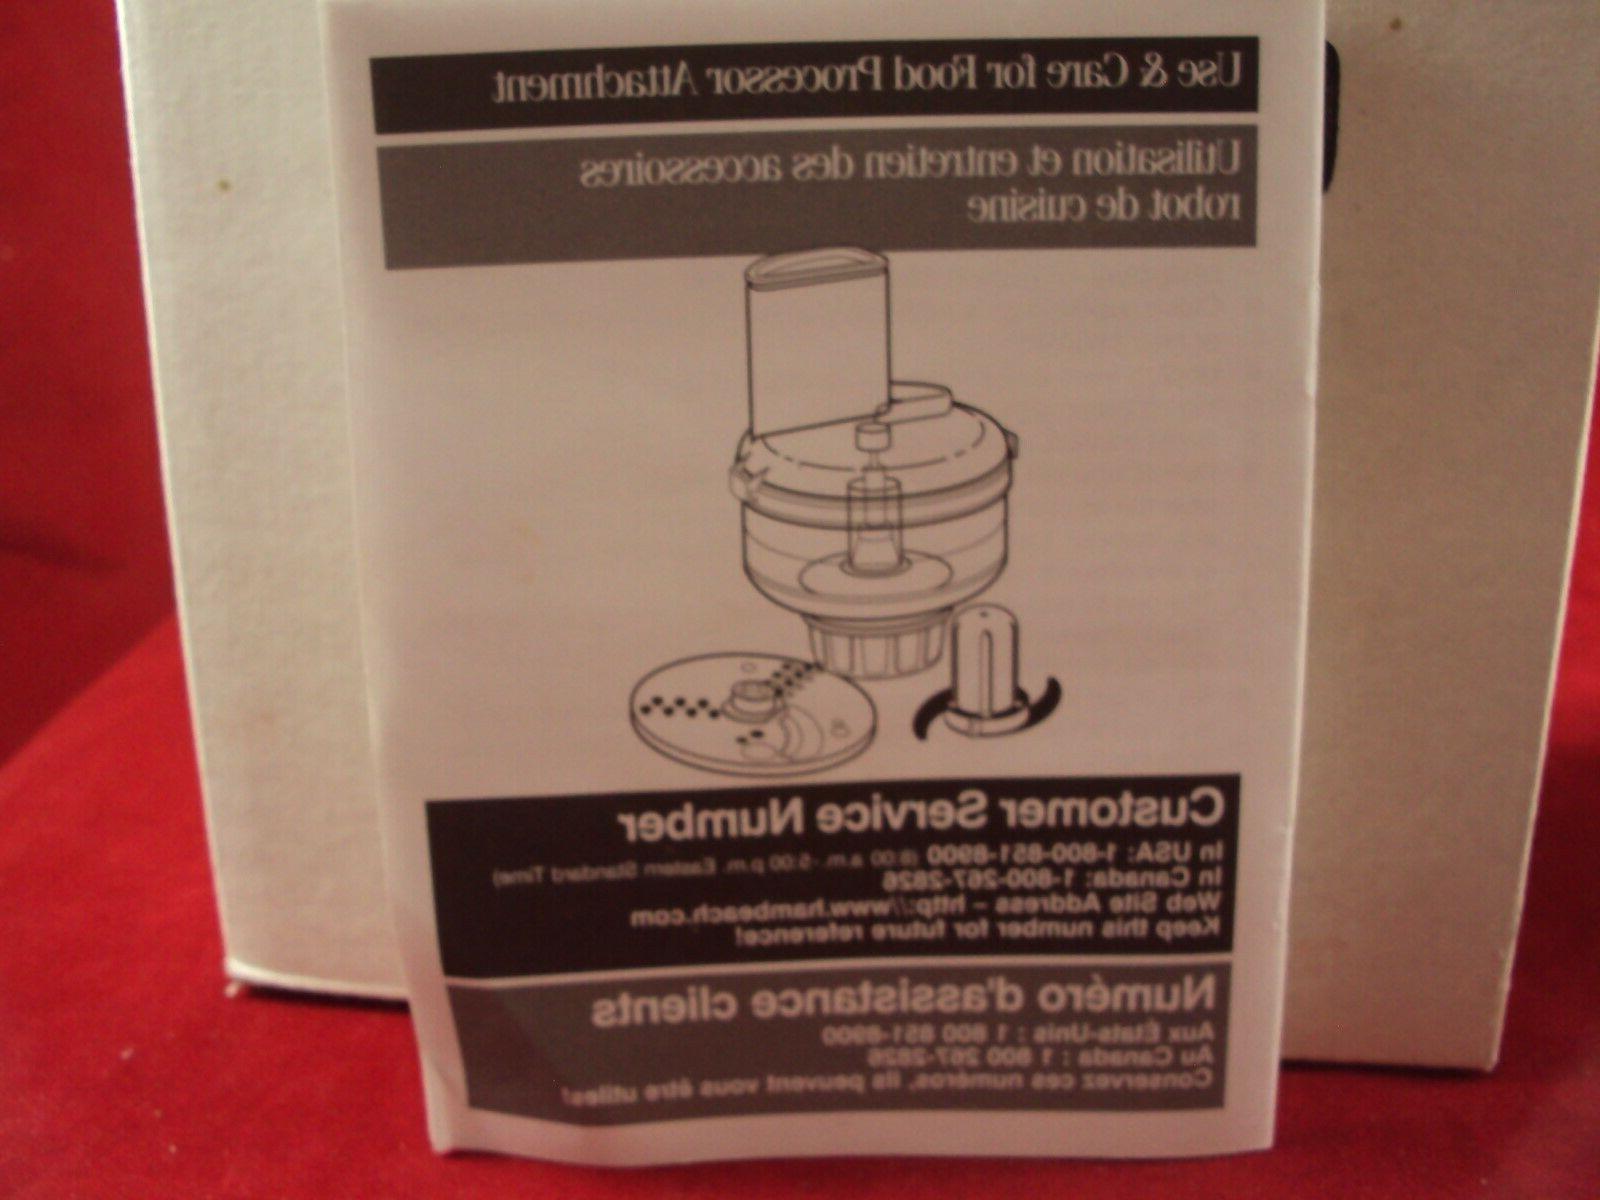 Hamilton Beach Blender Chef Food Attachment For Blender